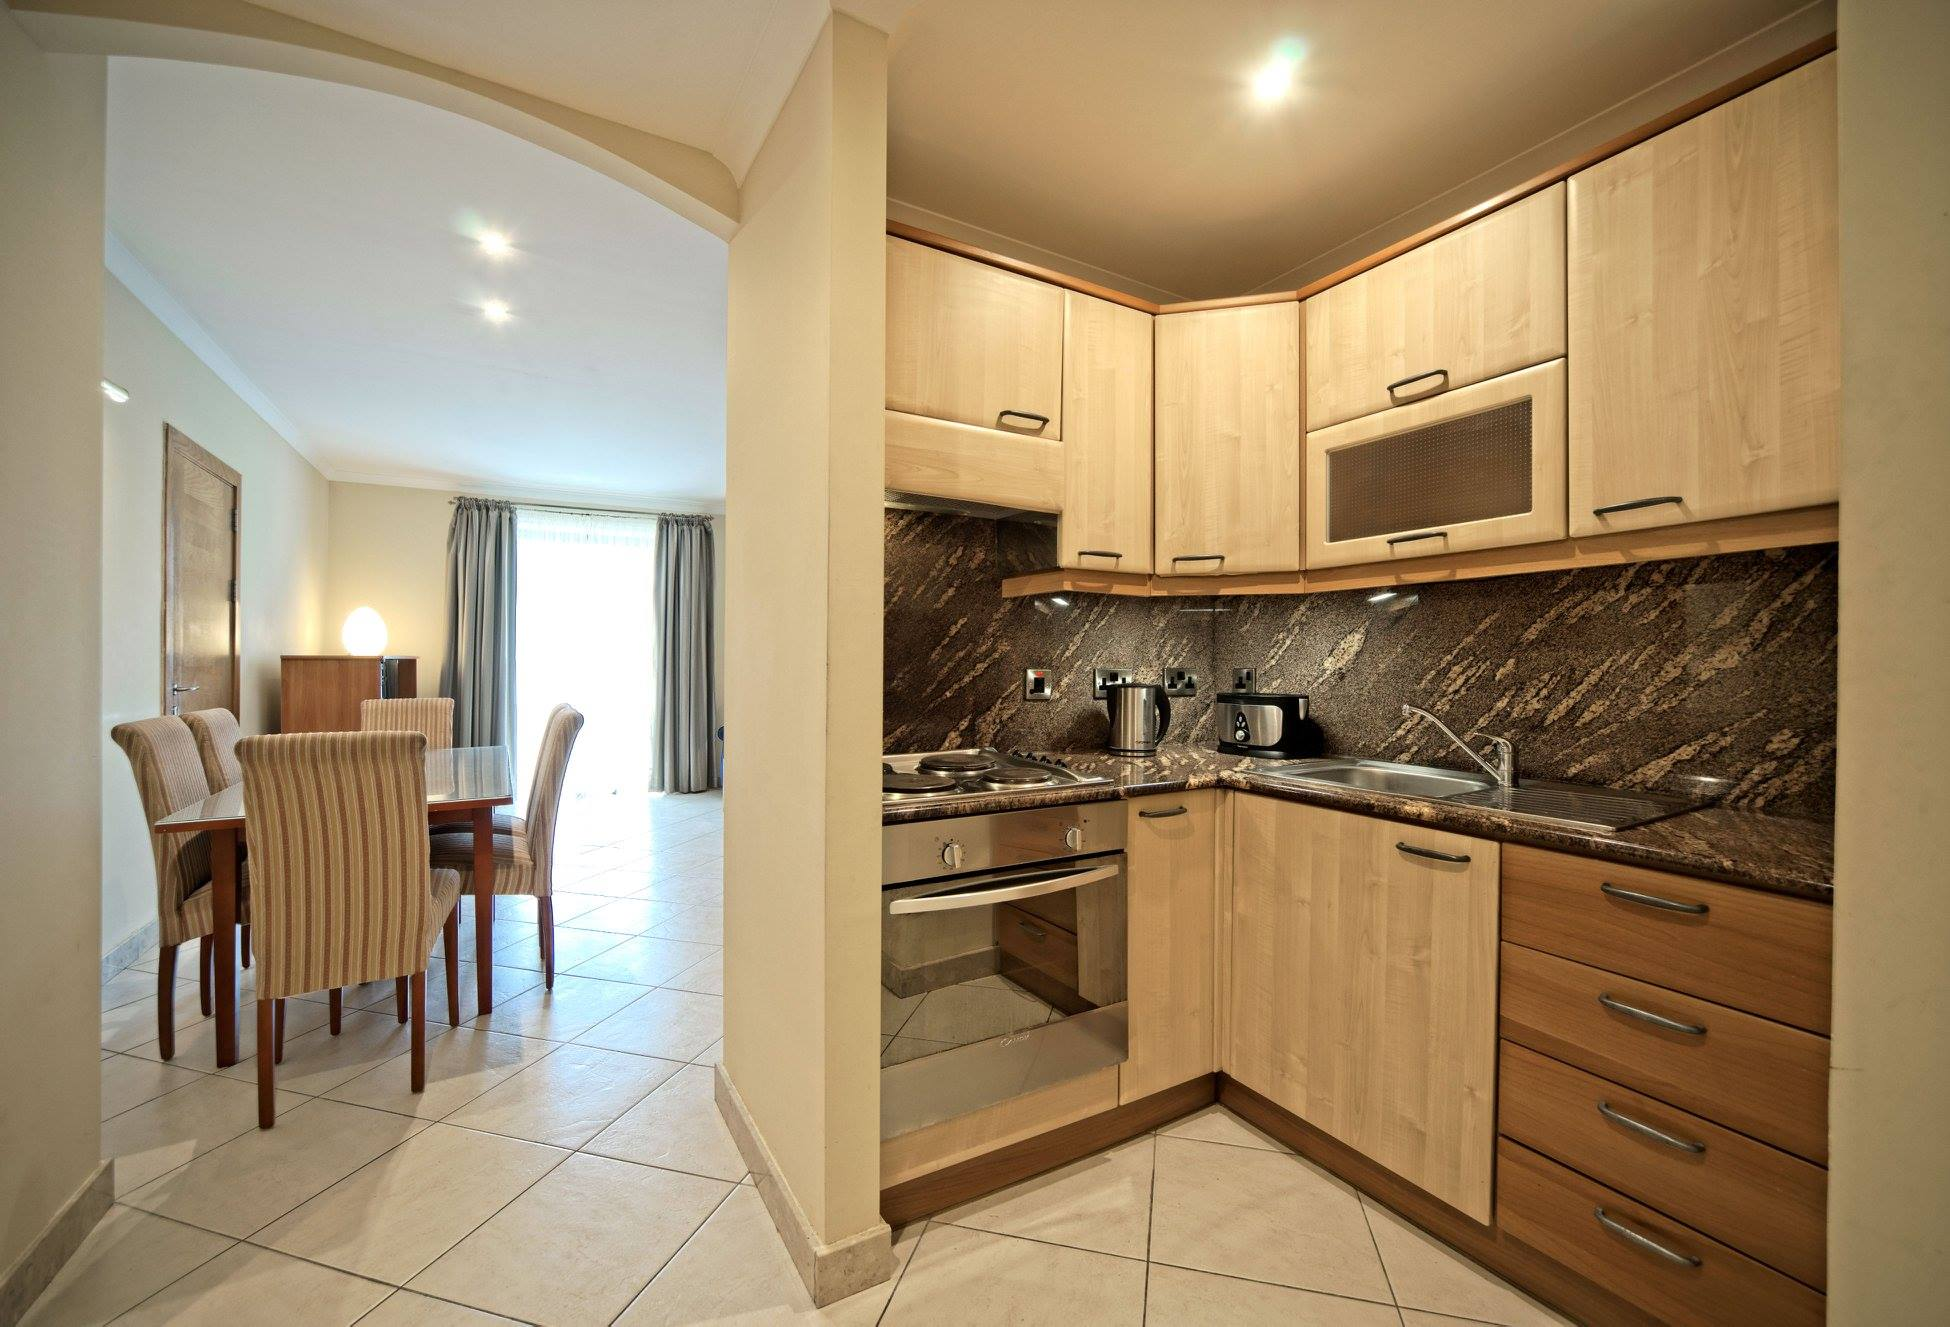 Aparthotel Malta Self Catering Kitchen With Dinin Area